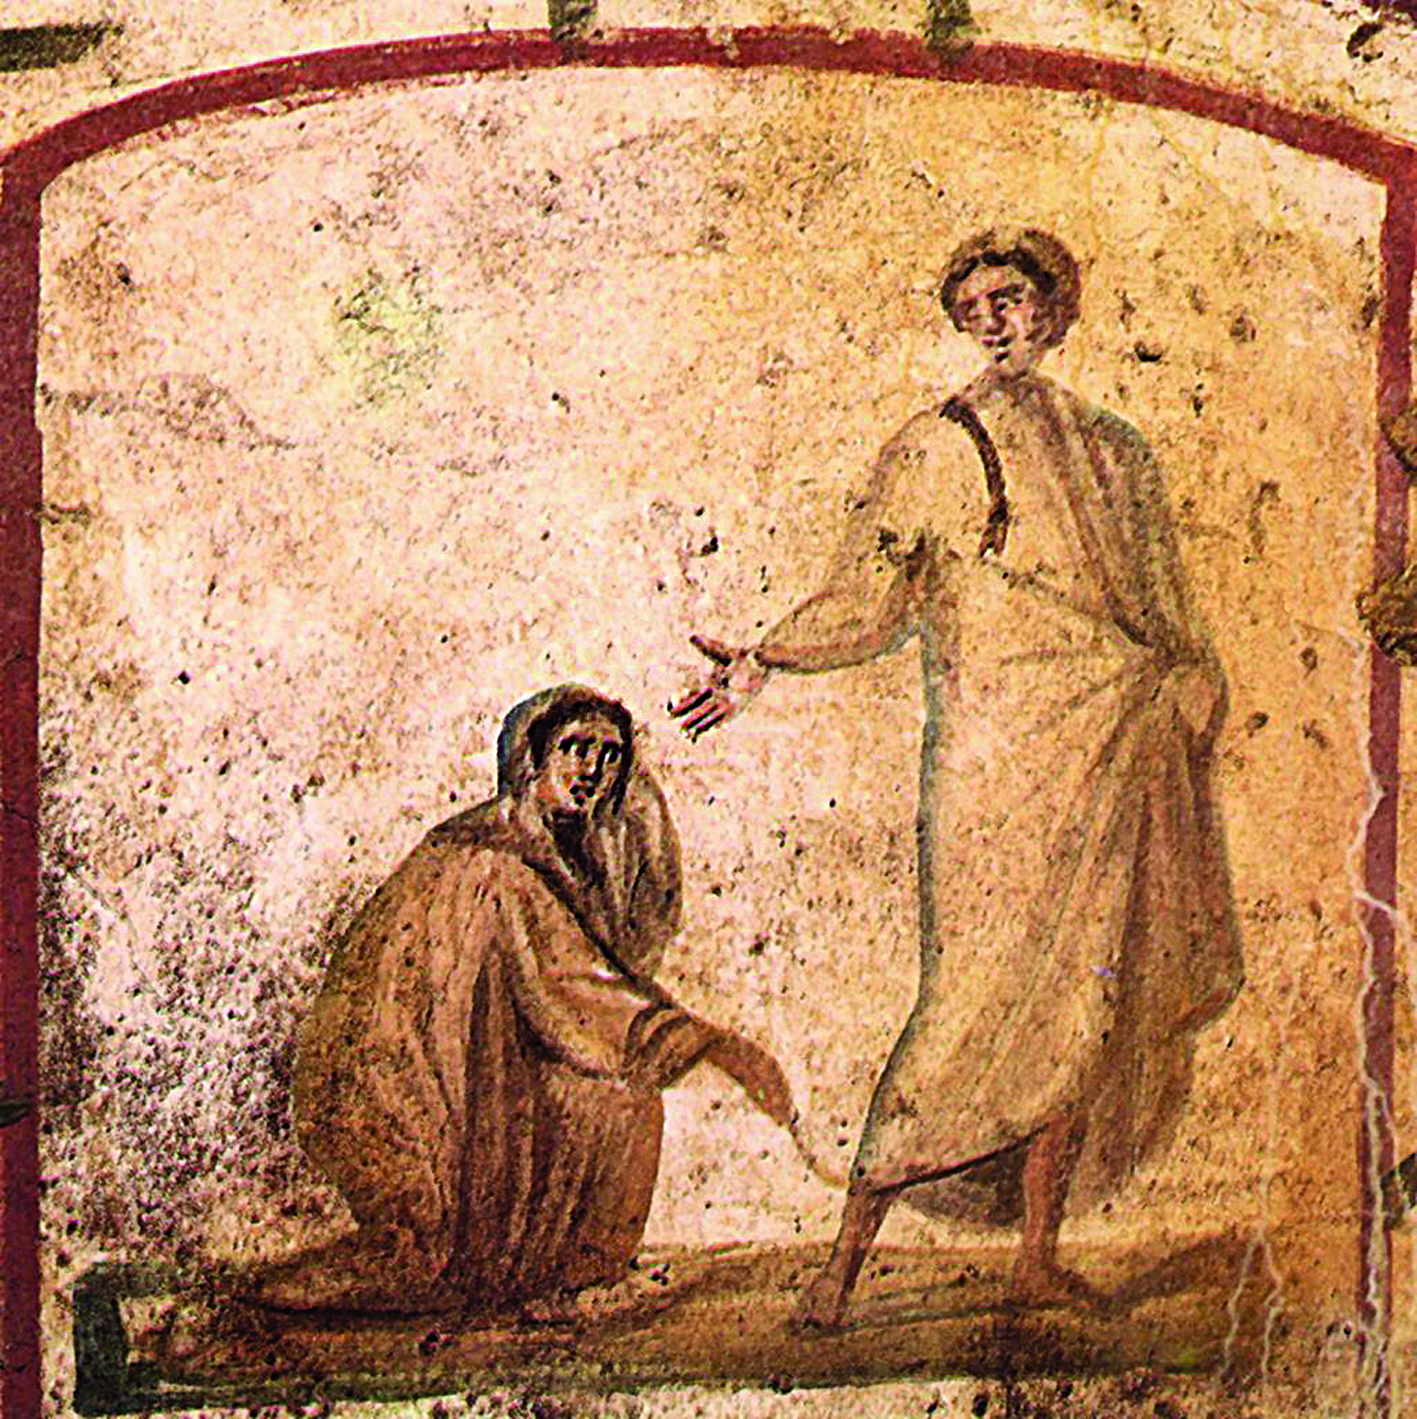 Исцеление кровоточивой. Катакомбы Петра и Марцеллина. Рим. III–V века